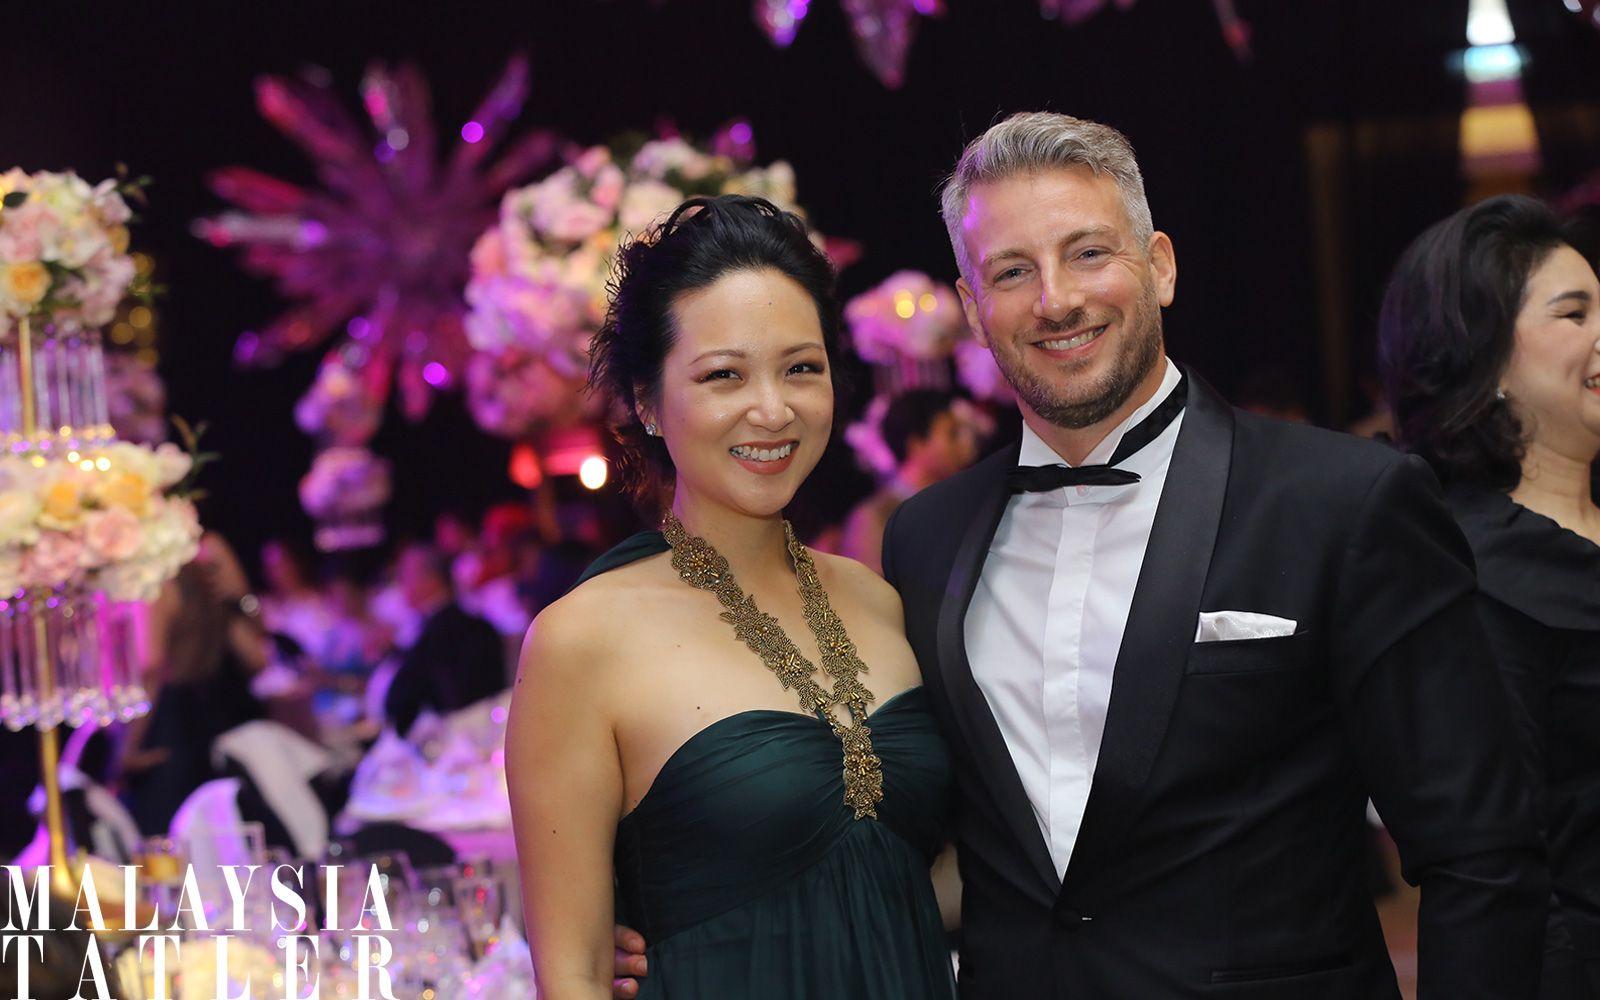 Gabrielle Tan-Helfman and Michael Helfman